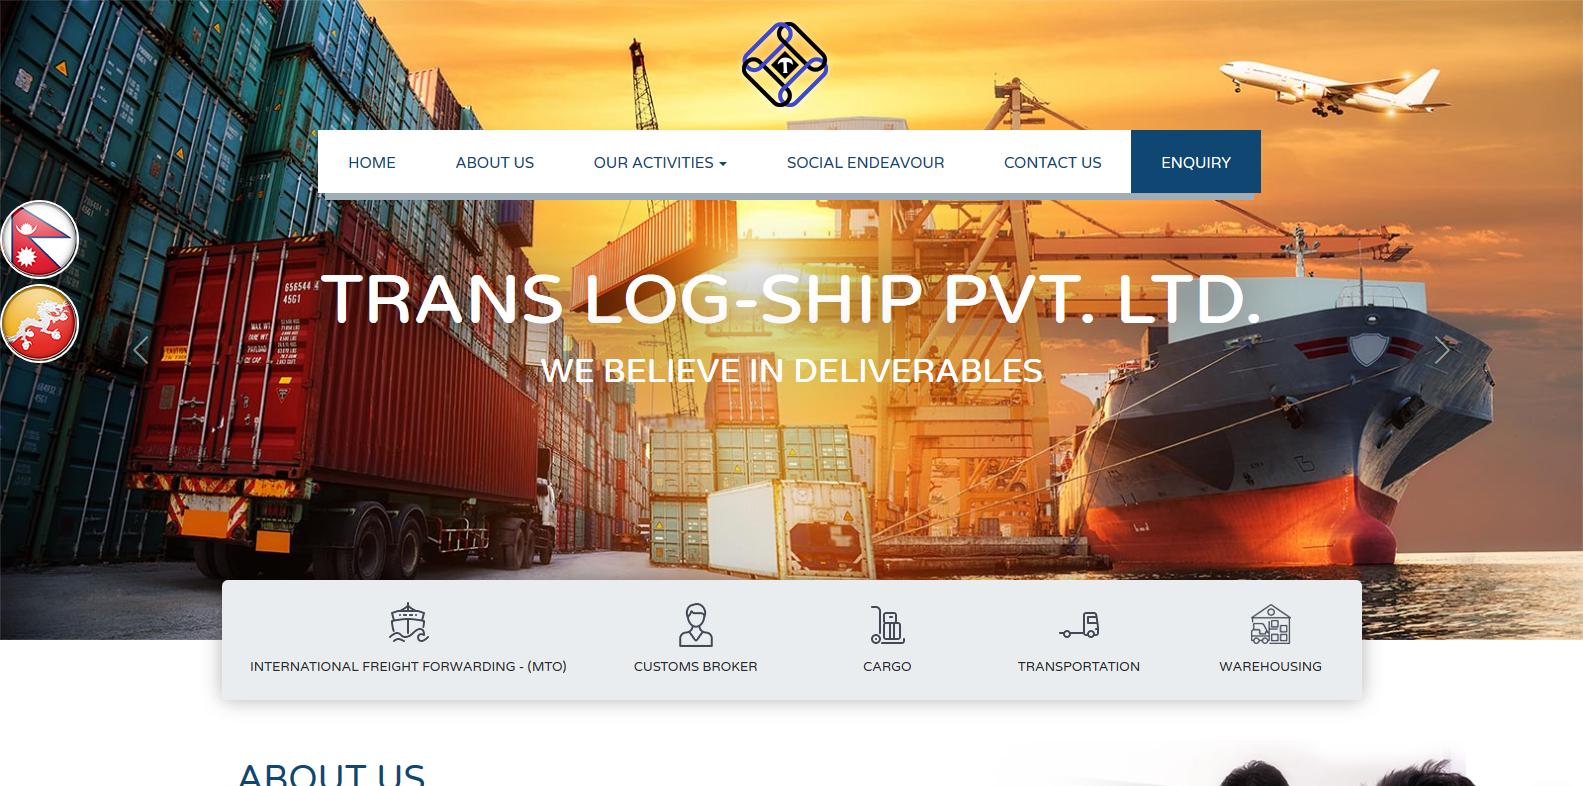 Trans Log-Ship Pvt. Ltd.